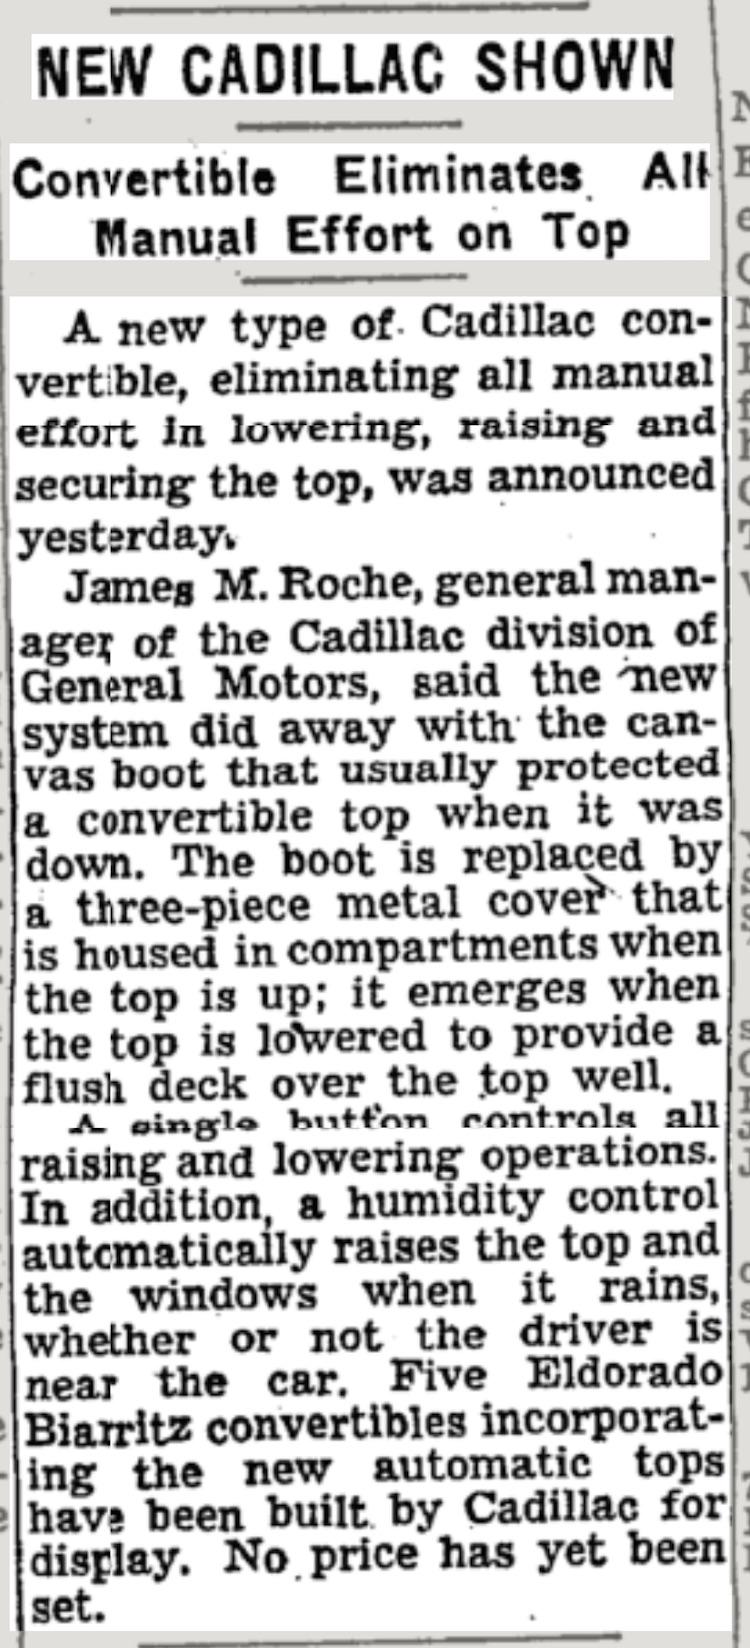 The Hog Ring - Cadillac Automatic Drop Top was a Big Deal